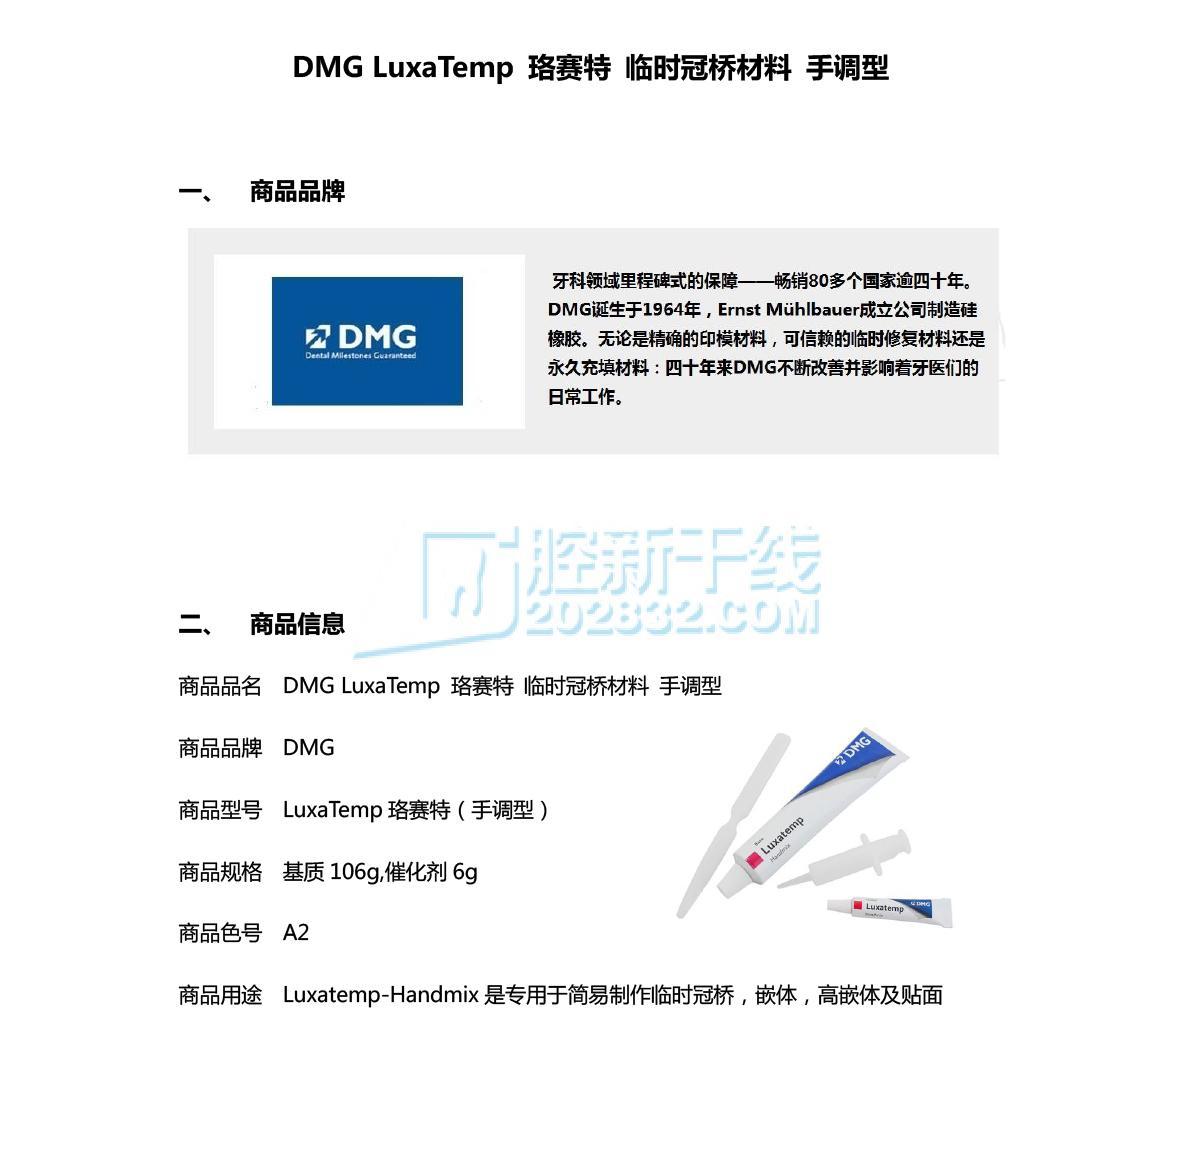 DMG LuxaTemp 珞赛特 临时冠桥材料-1.jpg